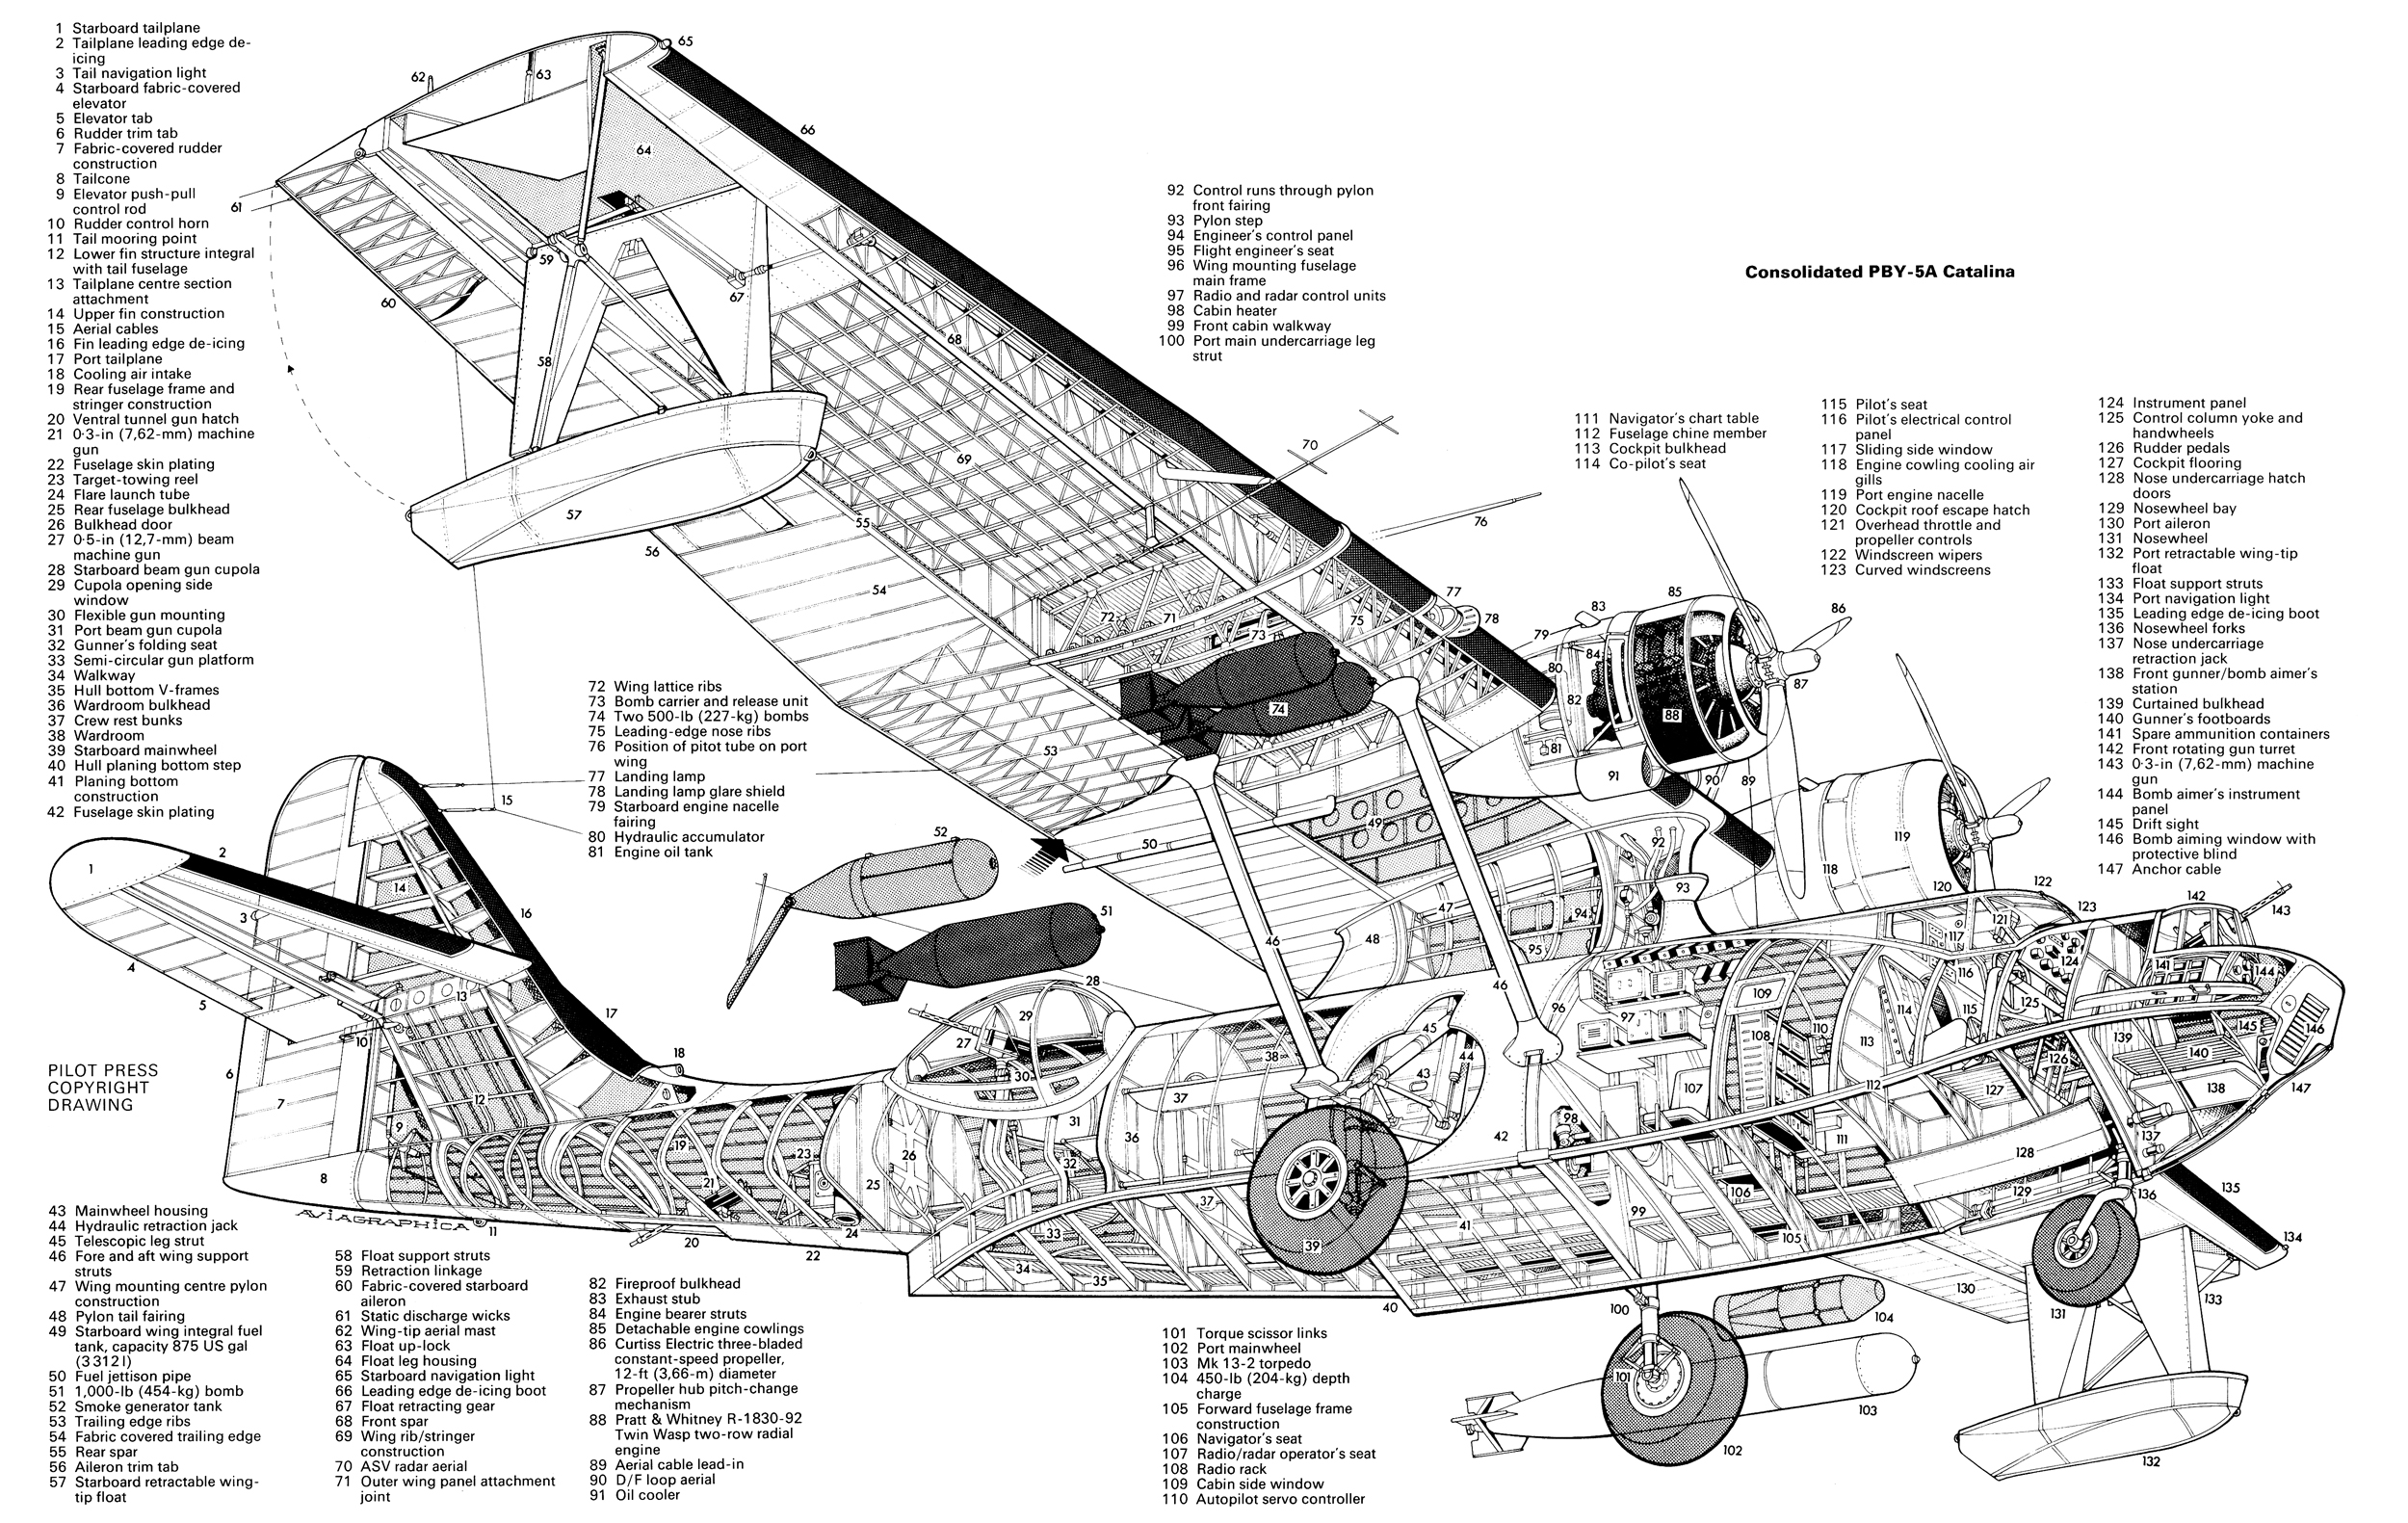 Consolidated PBY Catalina PDF eBook & Aircraft Flight